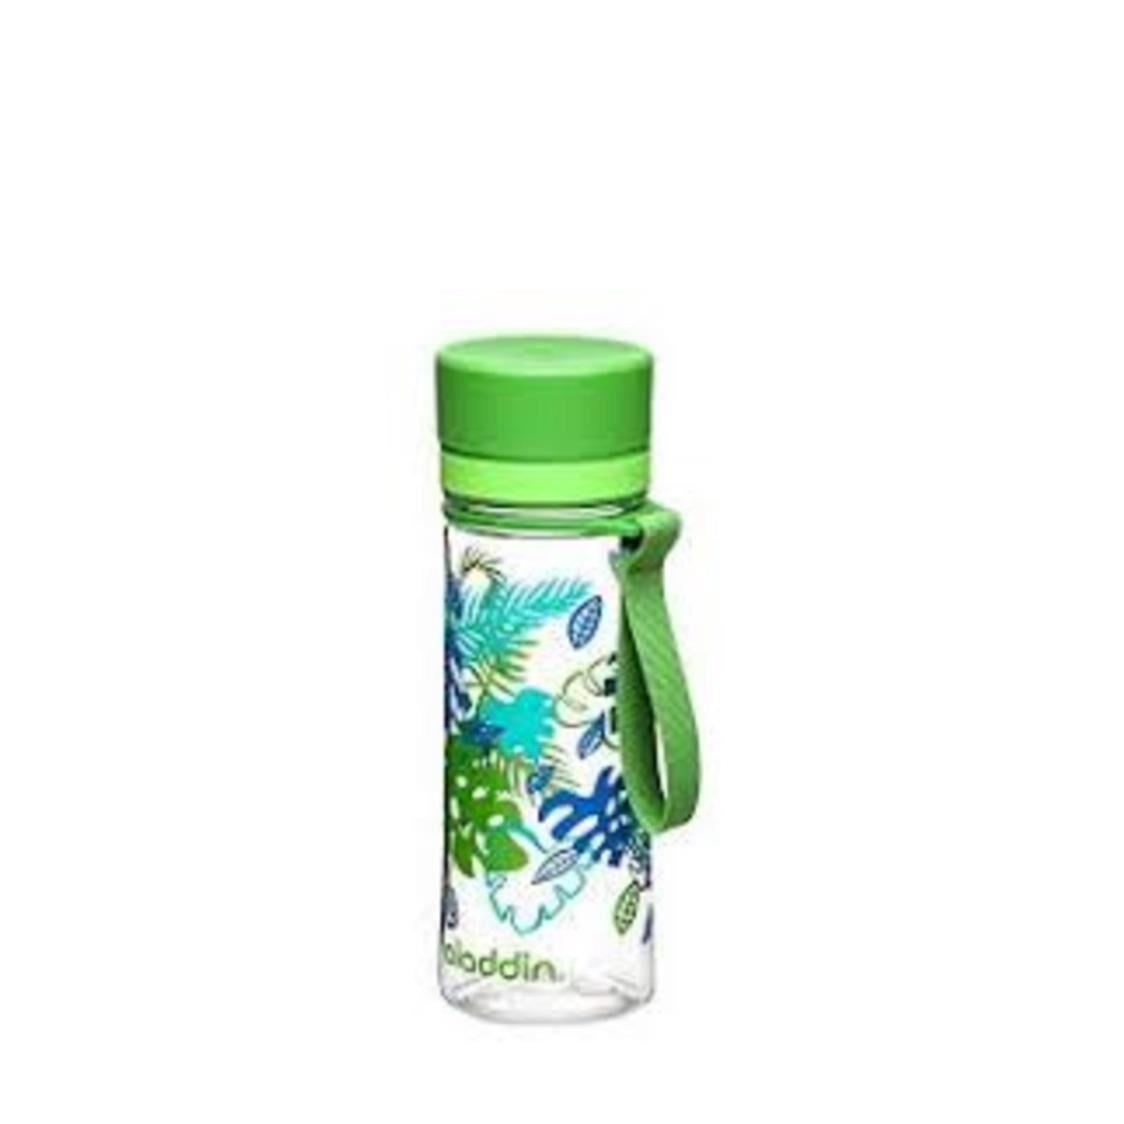 BPA-Free Aveo Water Bottle Graphic Green 03L 1101-BPA-F-GG